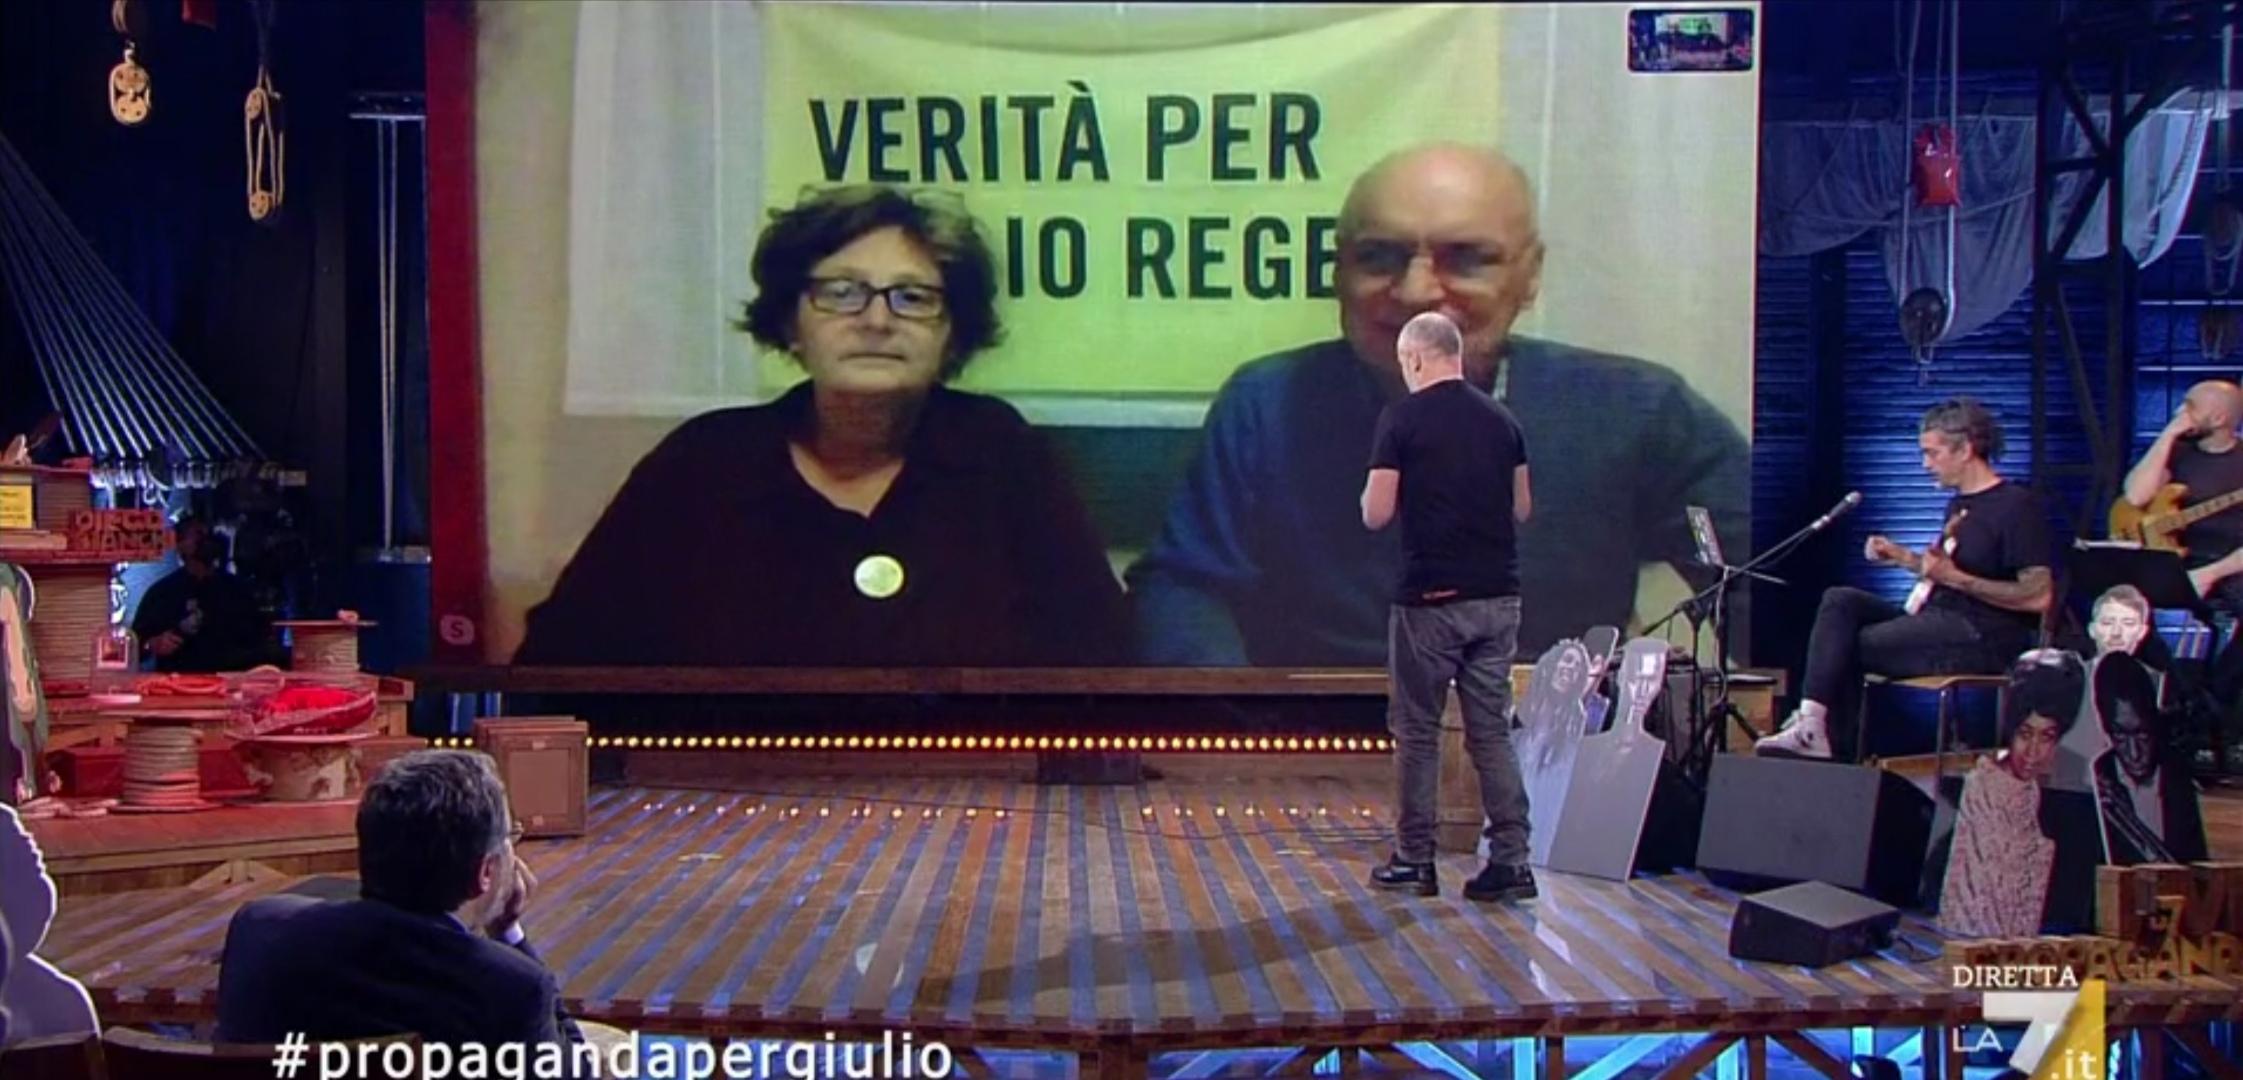 Propaganda live genitori Regeni copertina